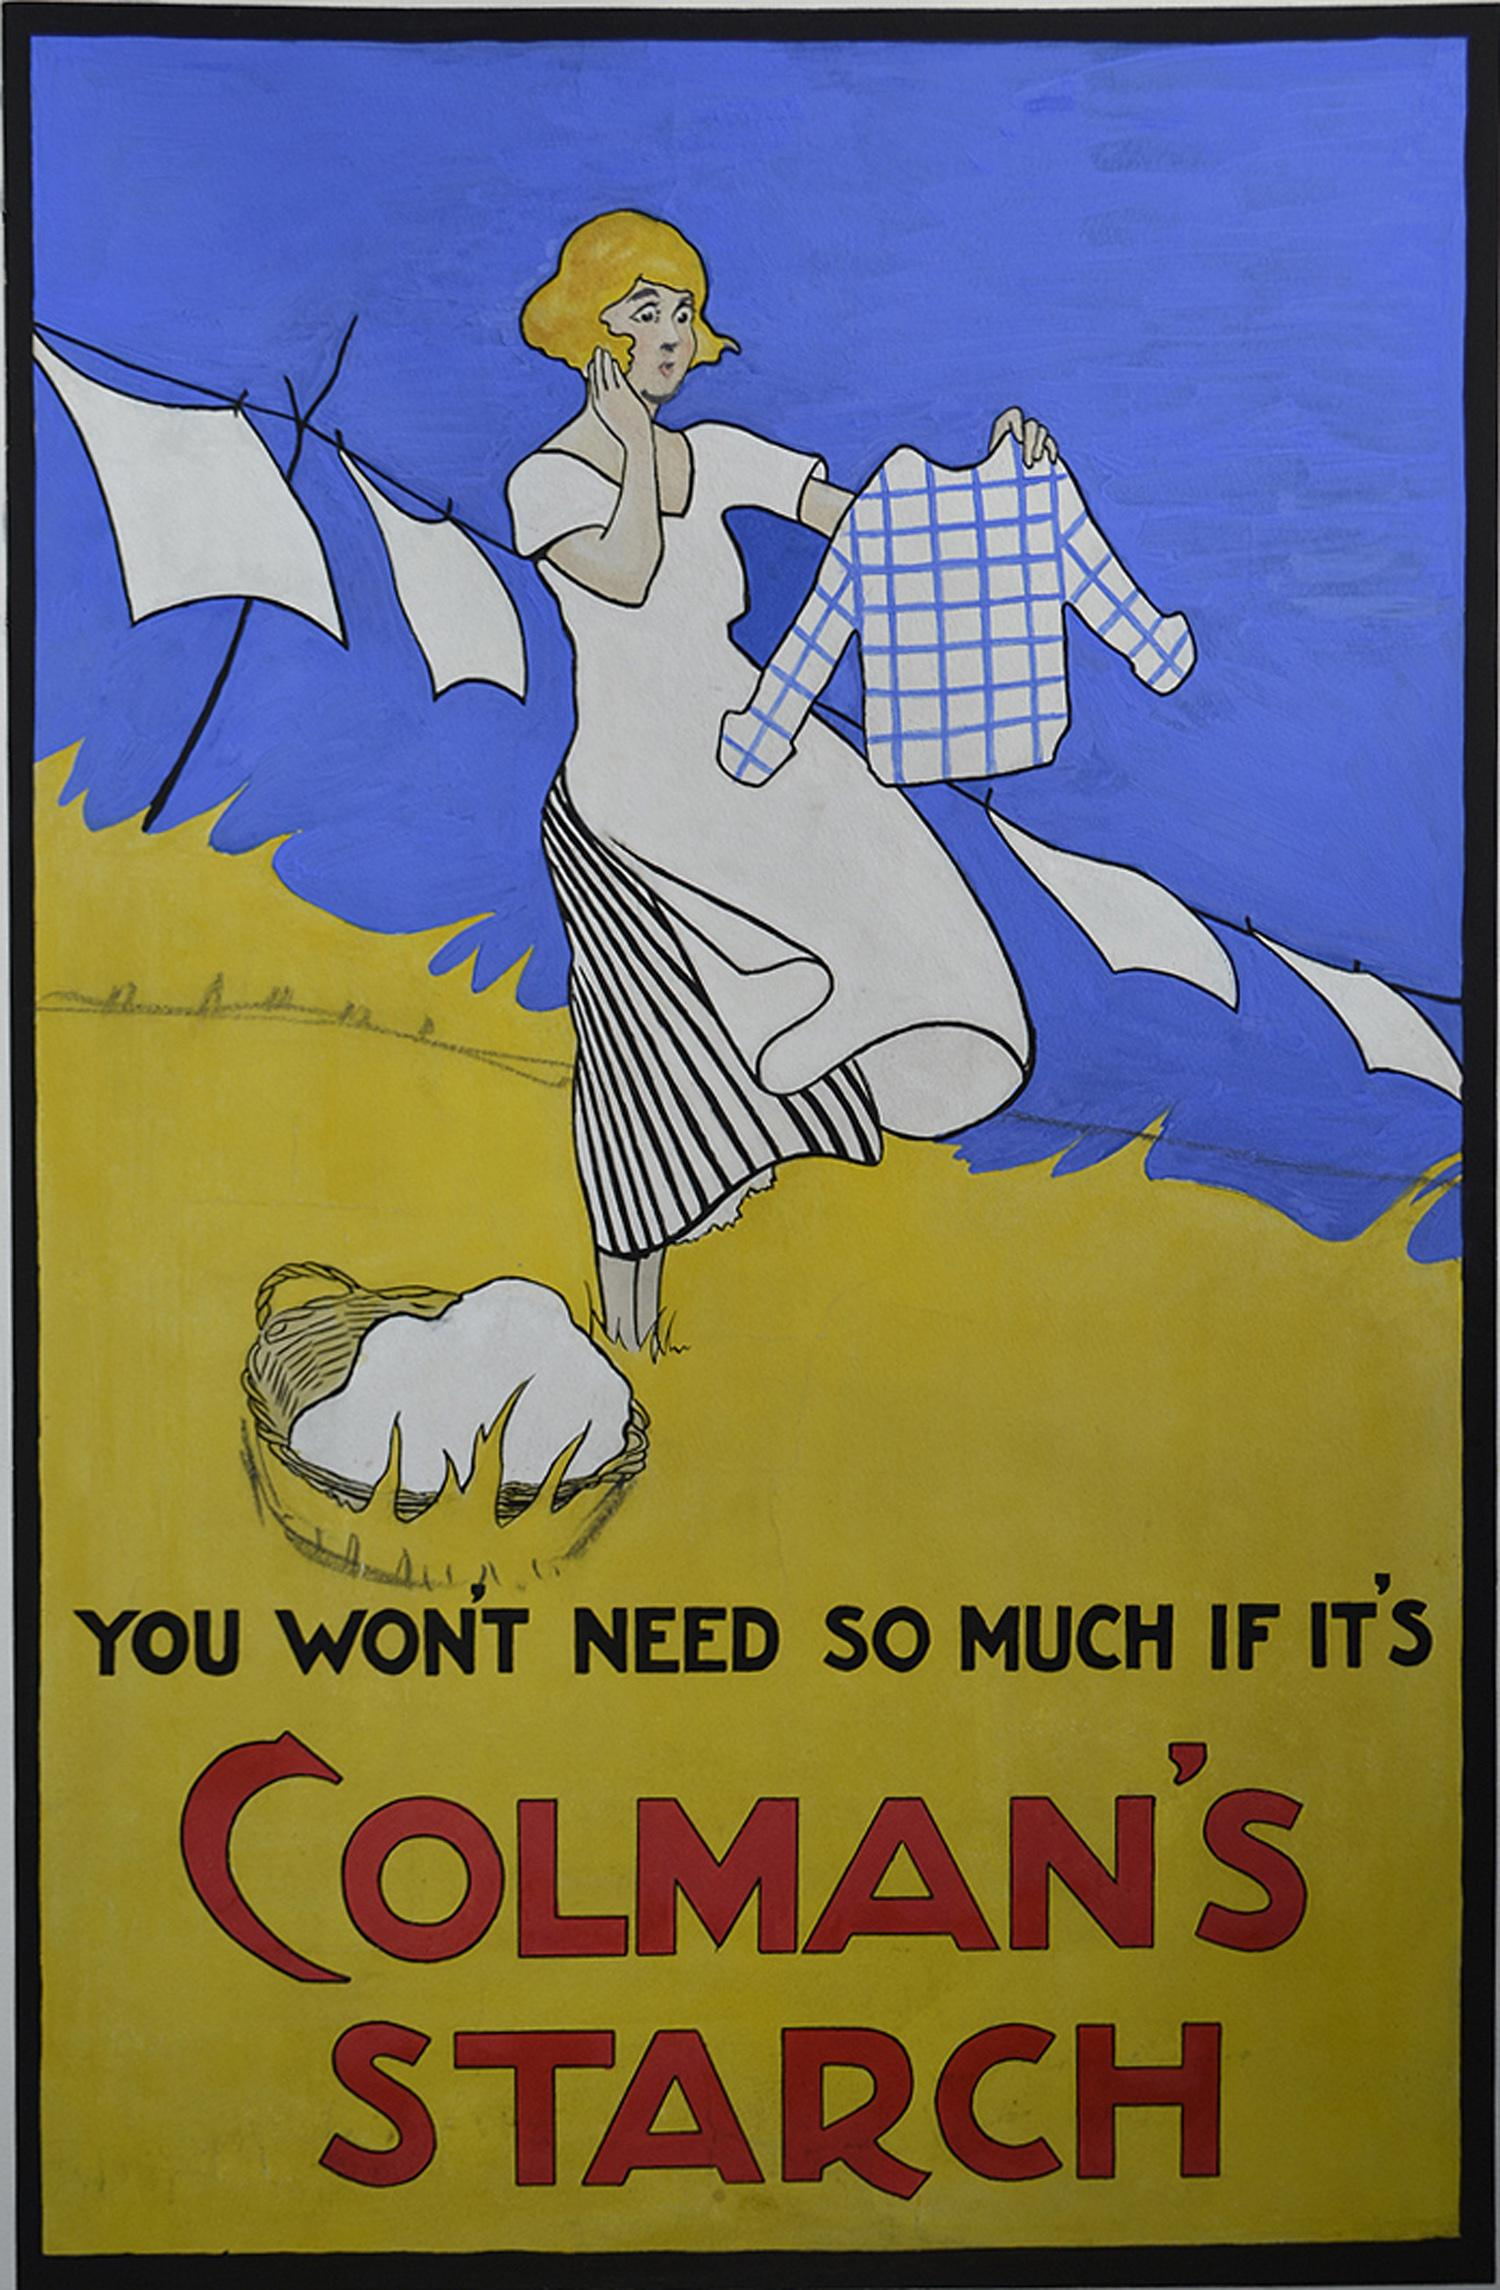 Colman's Starch, Art Deco Early 20th Century Gouache Poster Advertisement